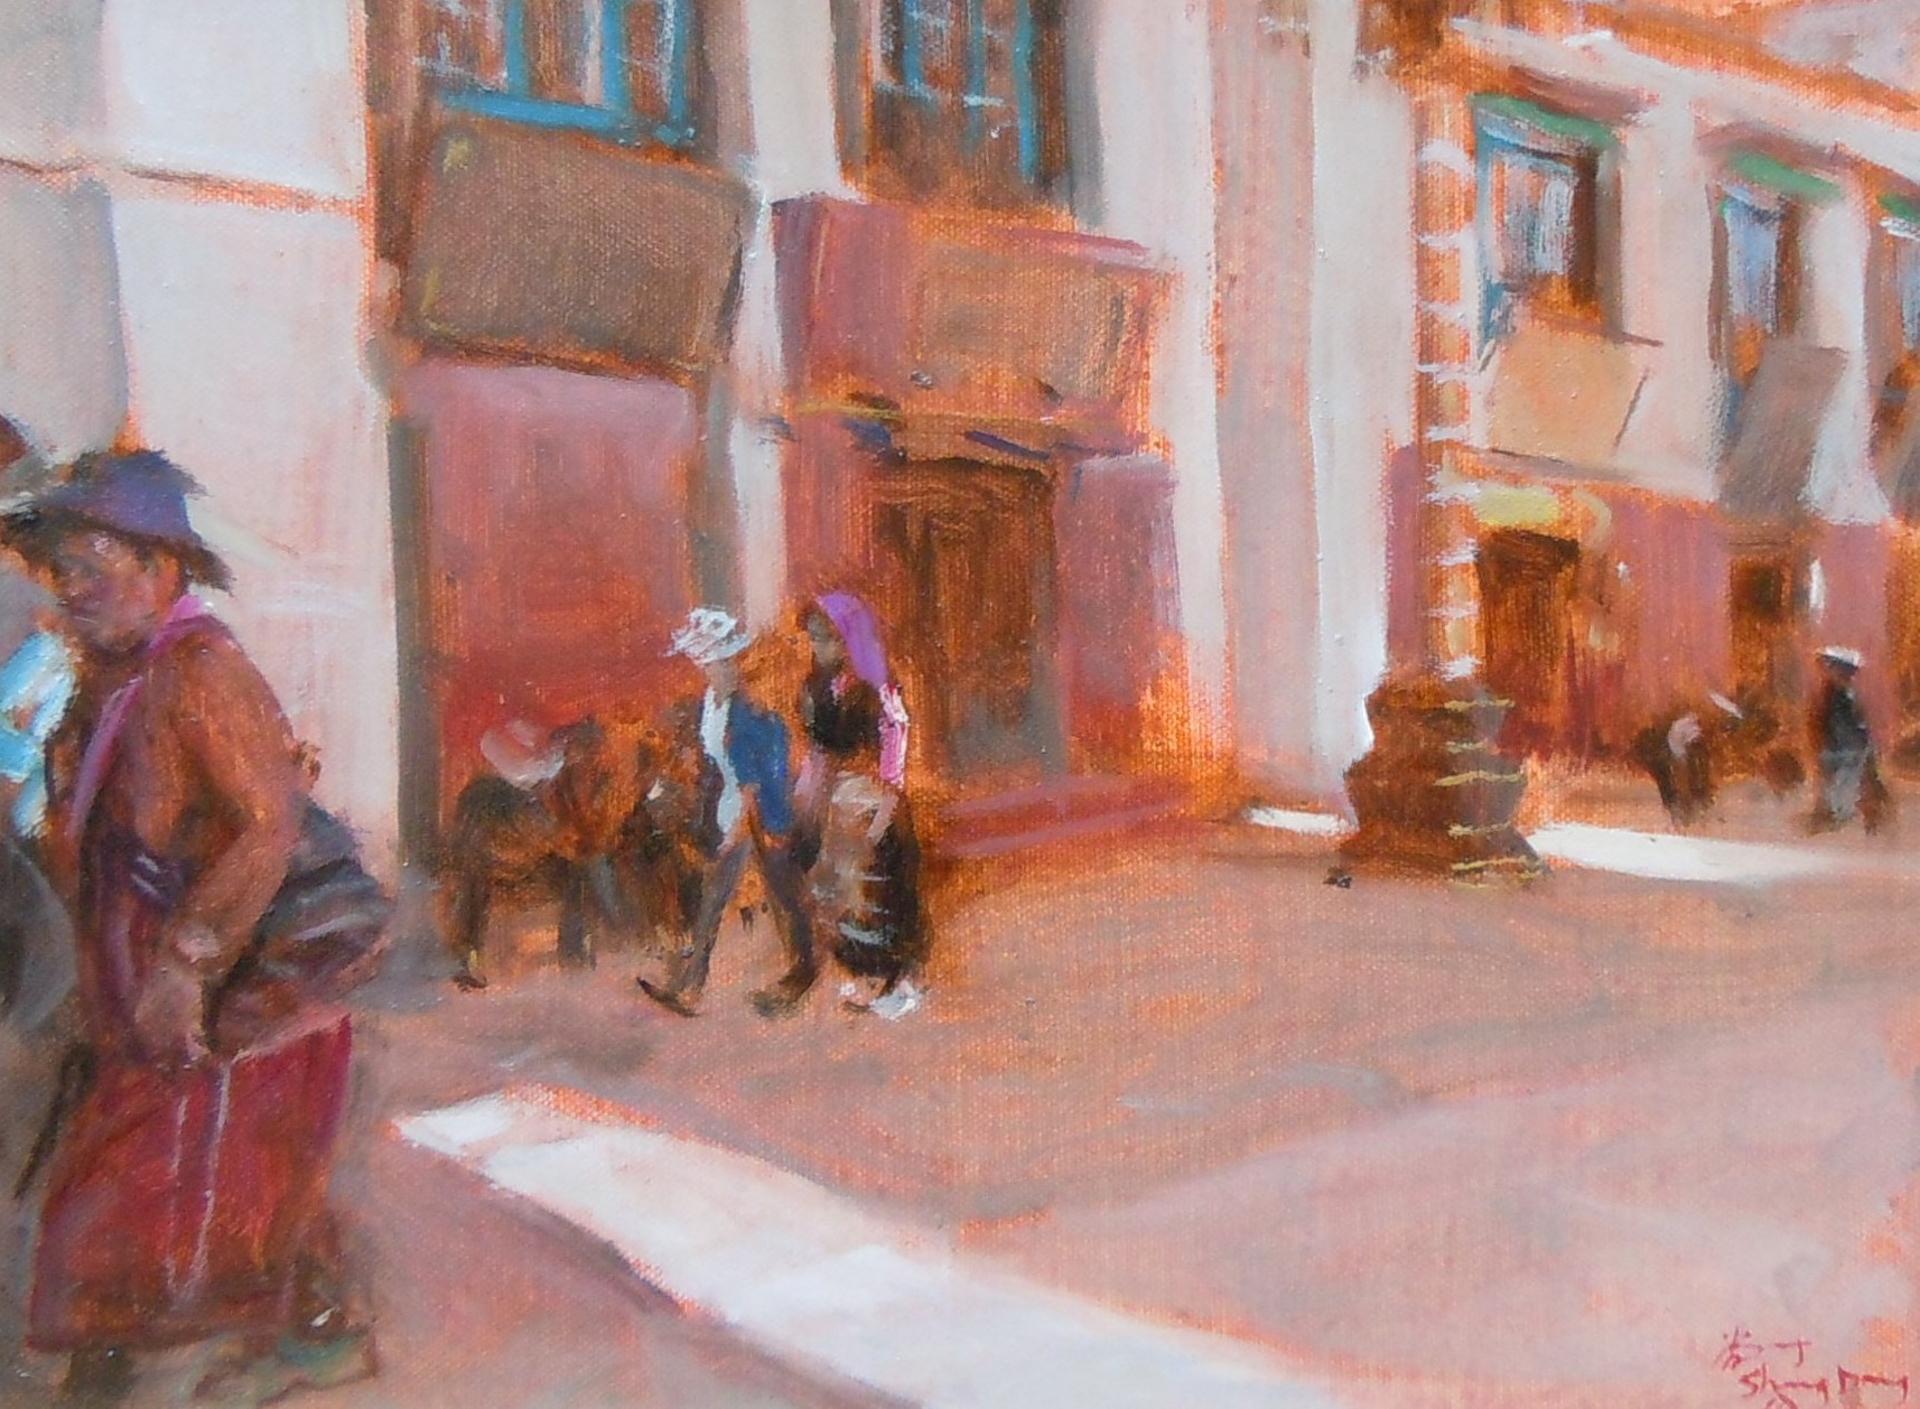 Tibetan Study 1 by Shang Ding